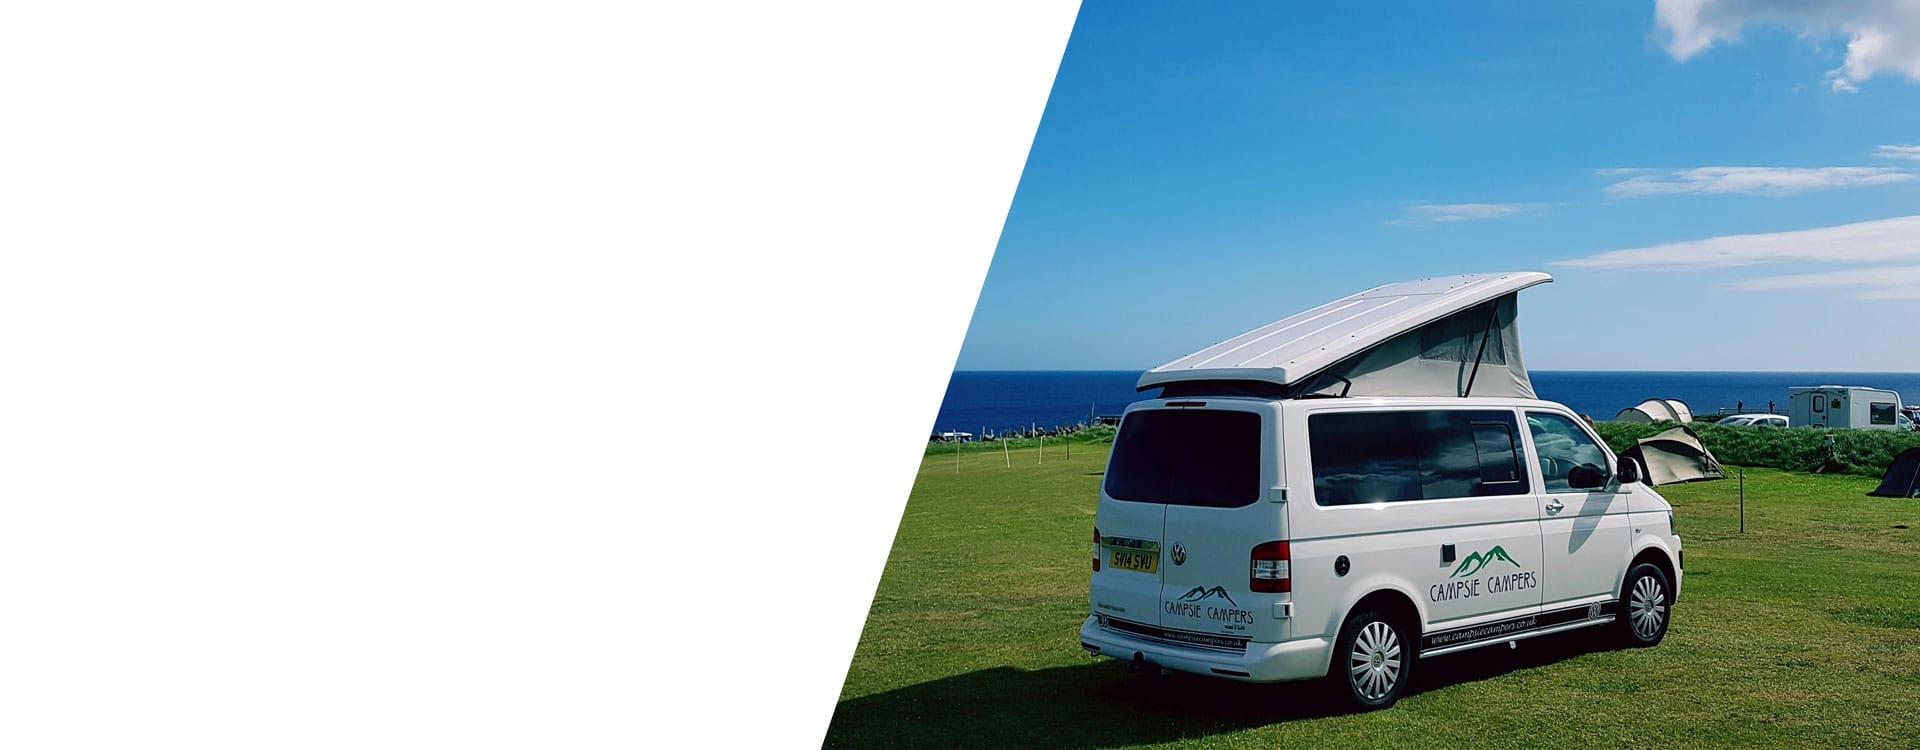 Campsie Wohnmobile Van